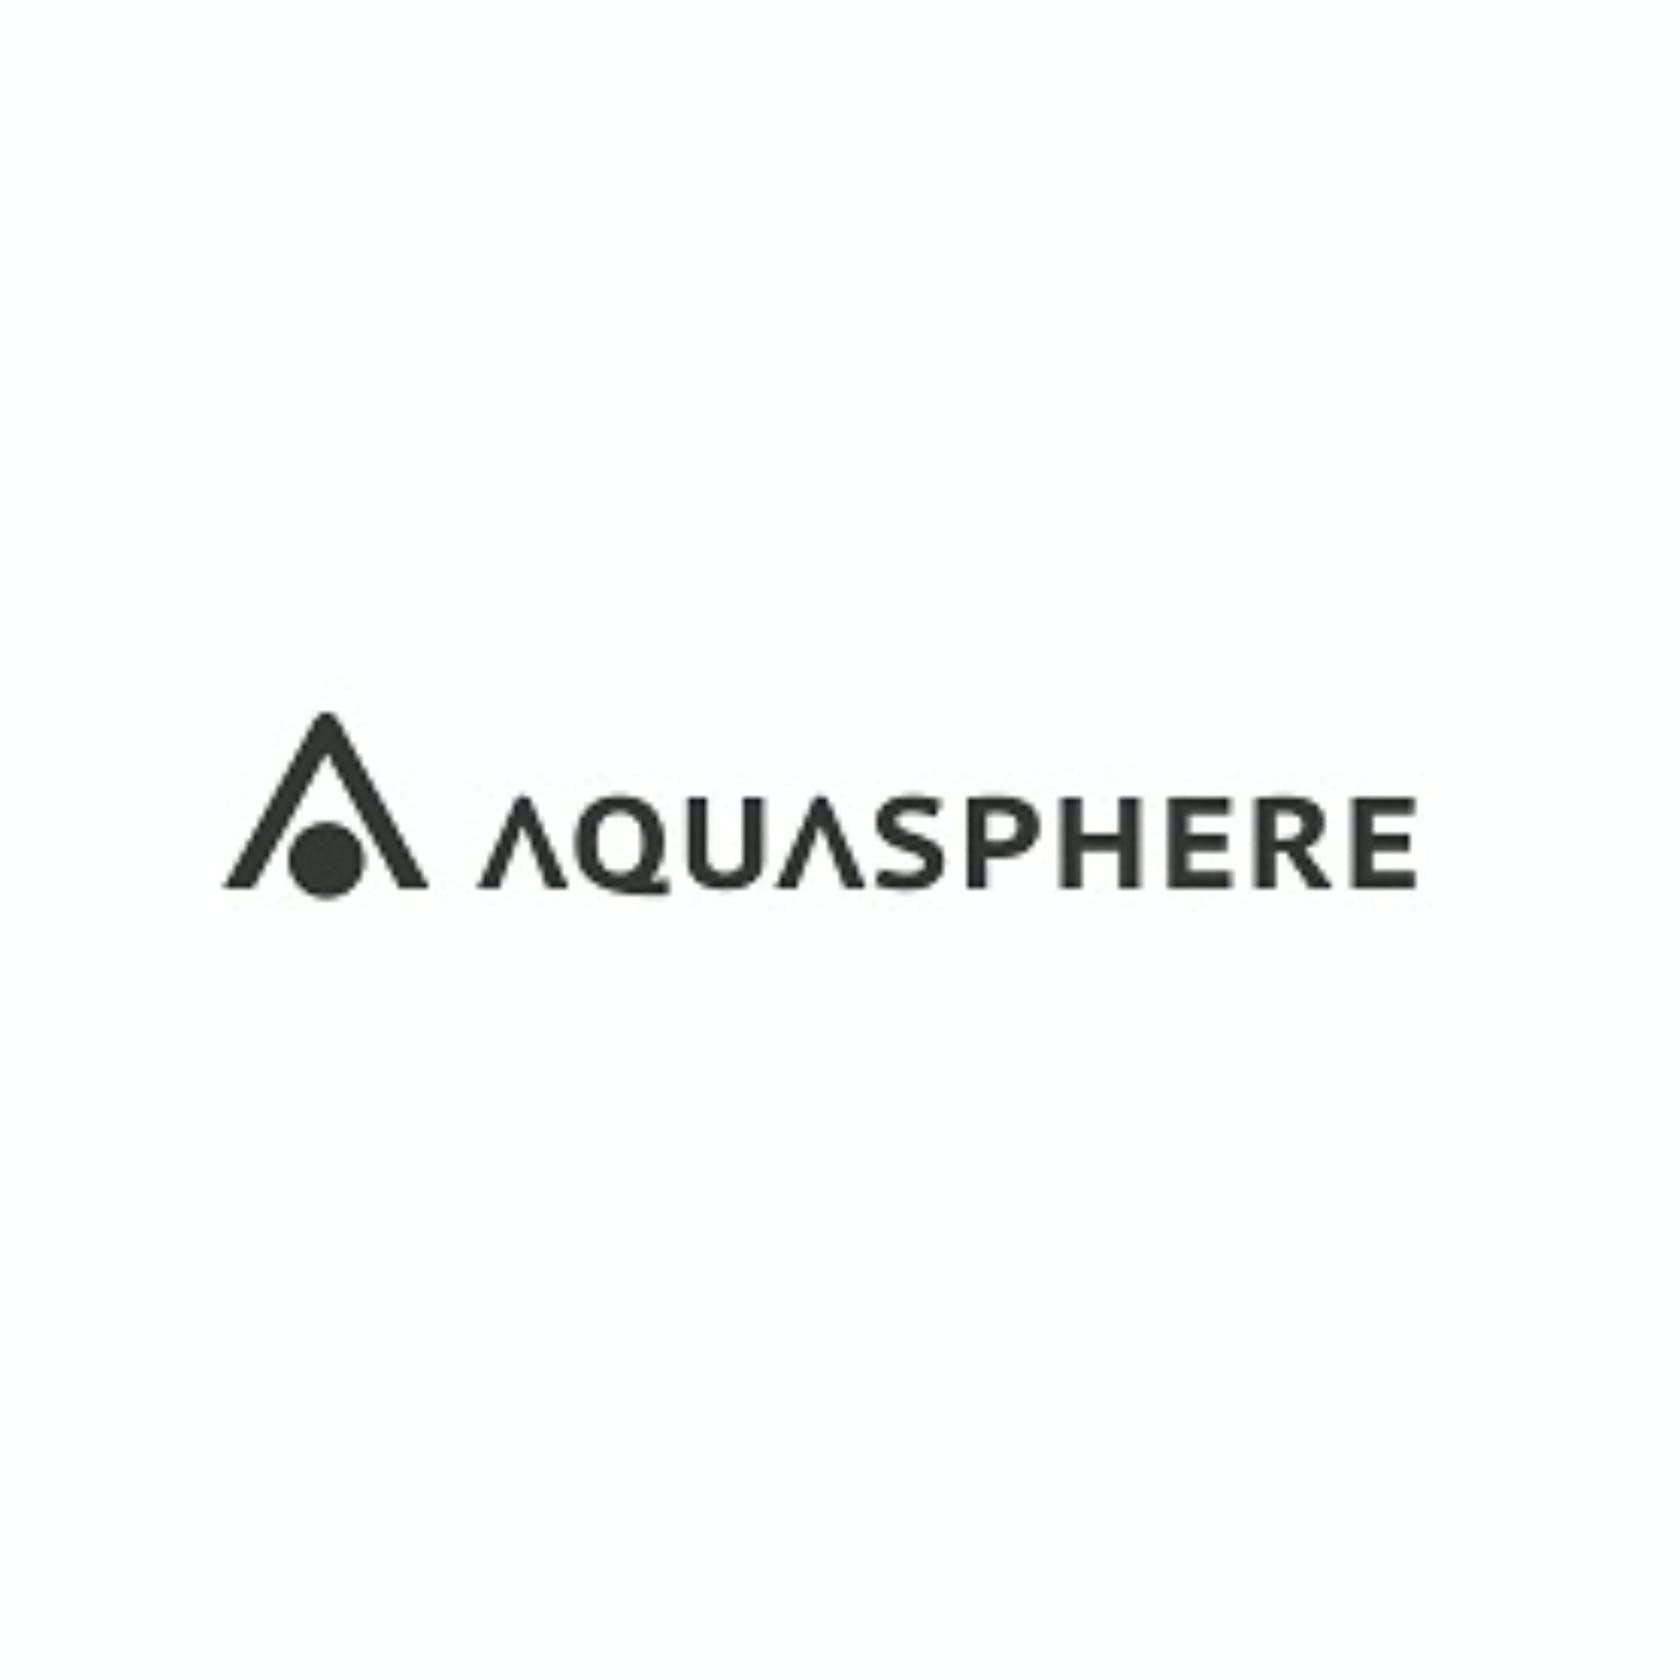 Aquasphere SPORTLER Onlineshop